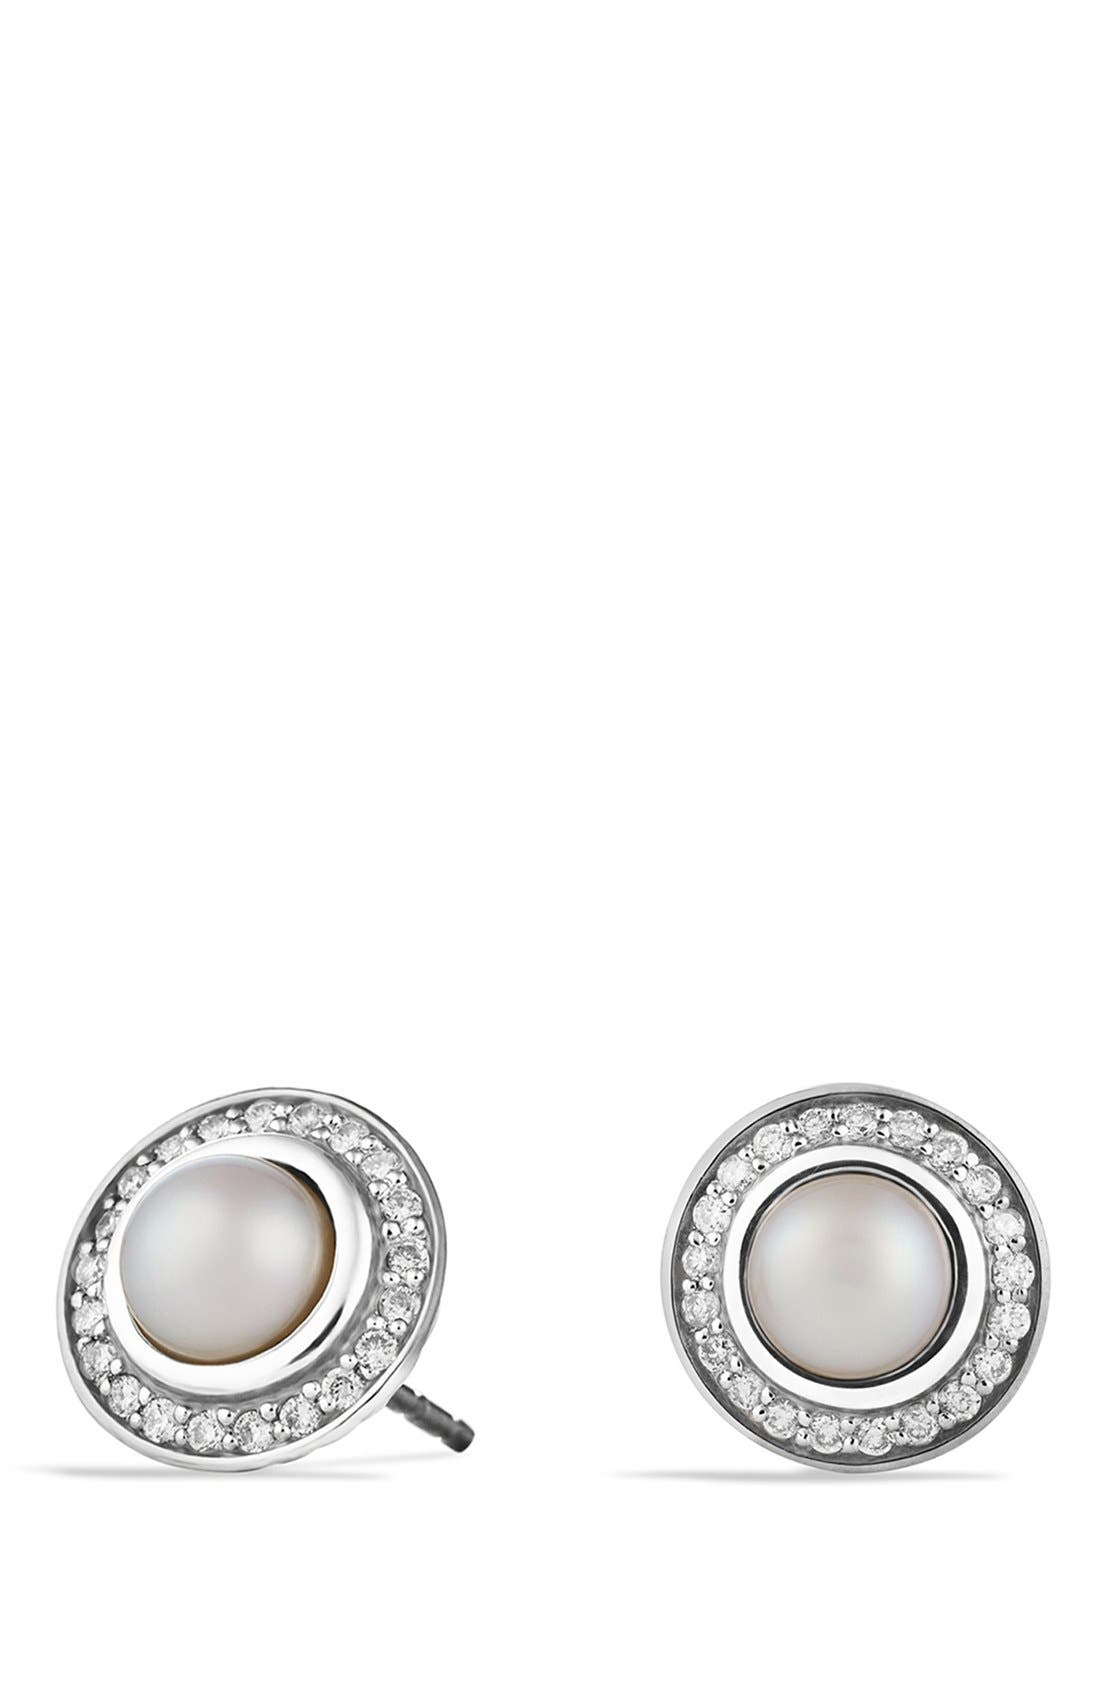 'Cerise' Mini Earrings with Semiprecious Stone & Diamonds,                             Main thumbnail 1, color,                             Pearl